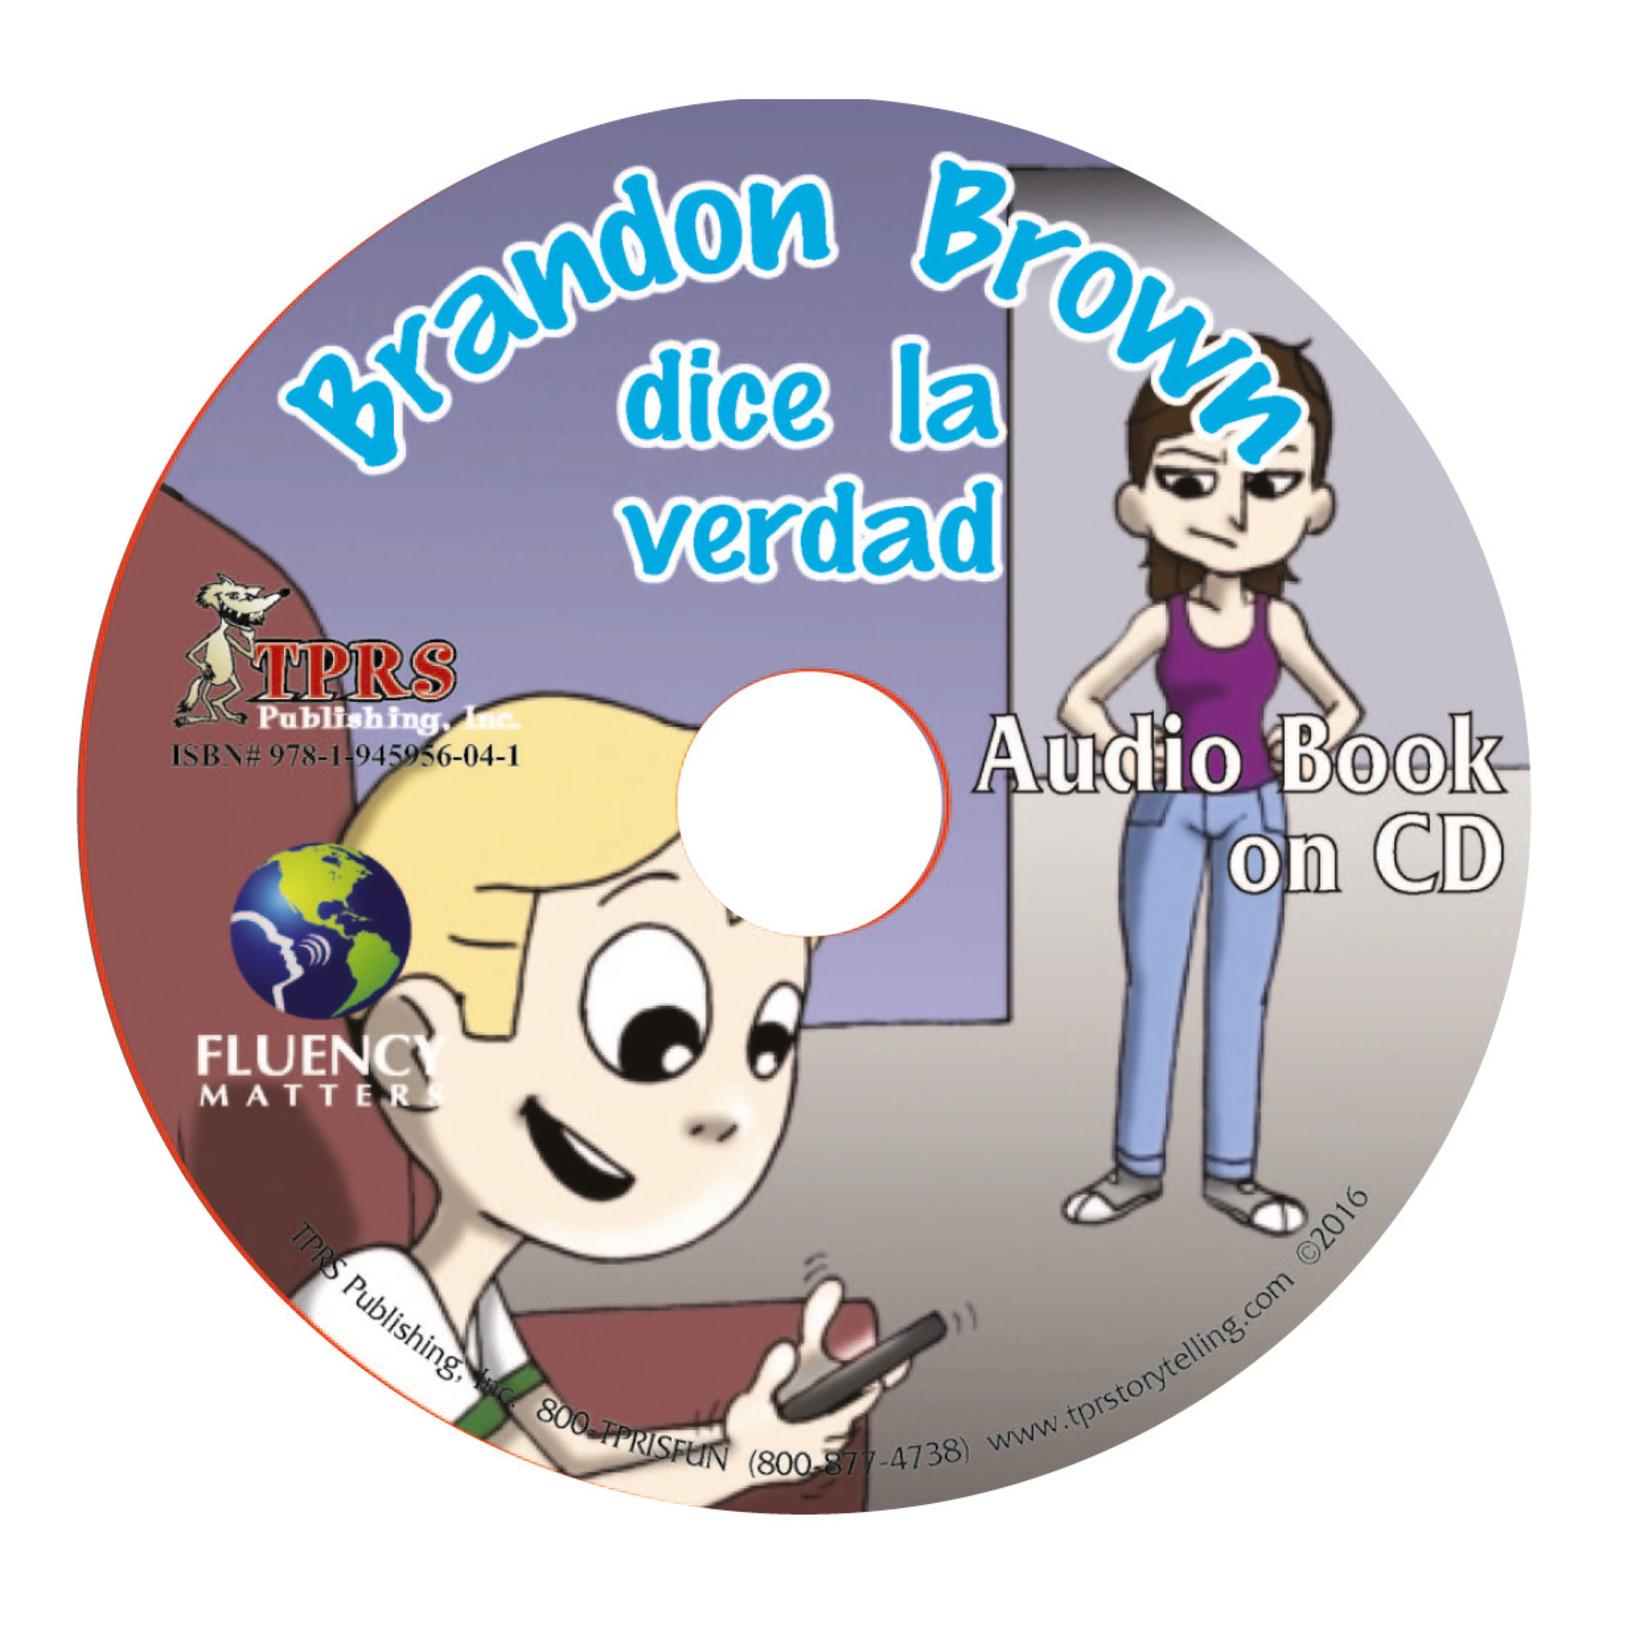 Fluency Matters Brandon Brown dice la verdad - Luisterboek